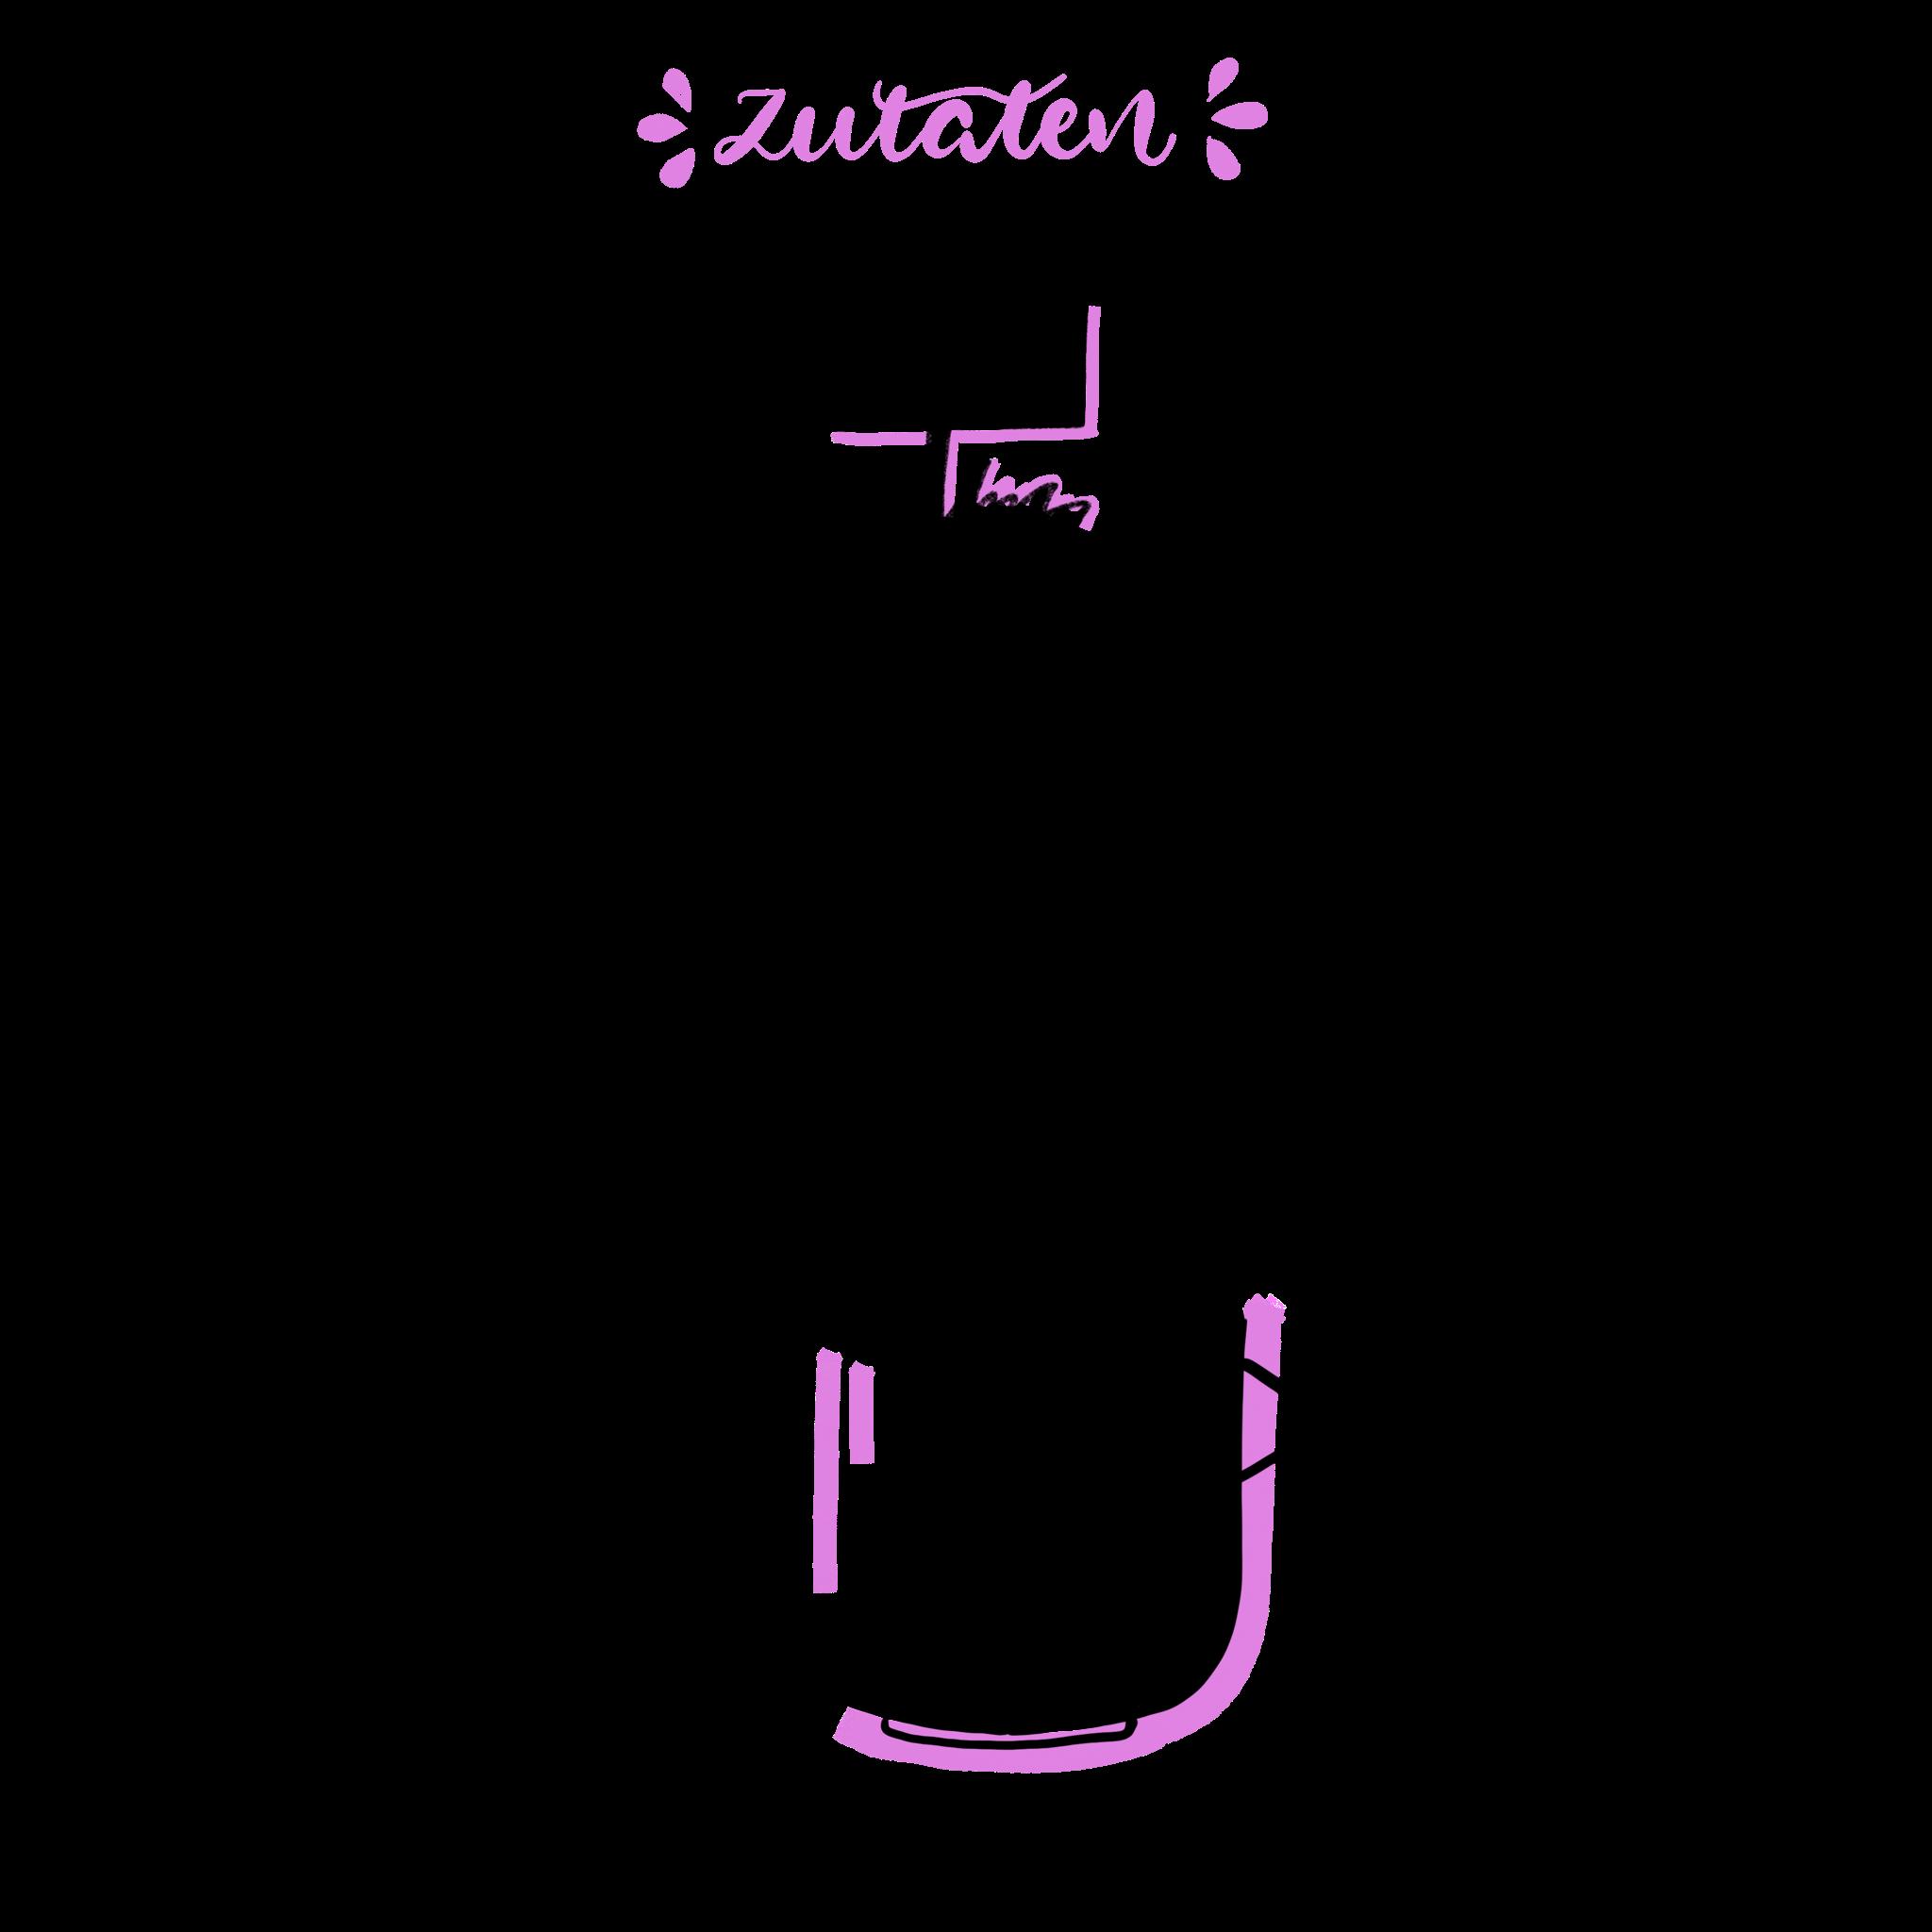 Sketnotes_Zutaten